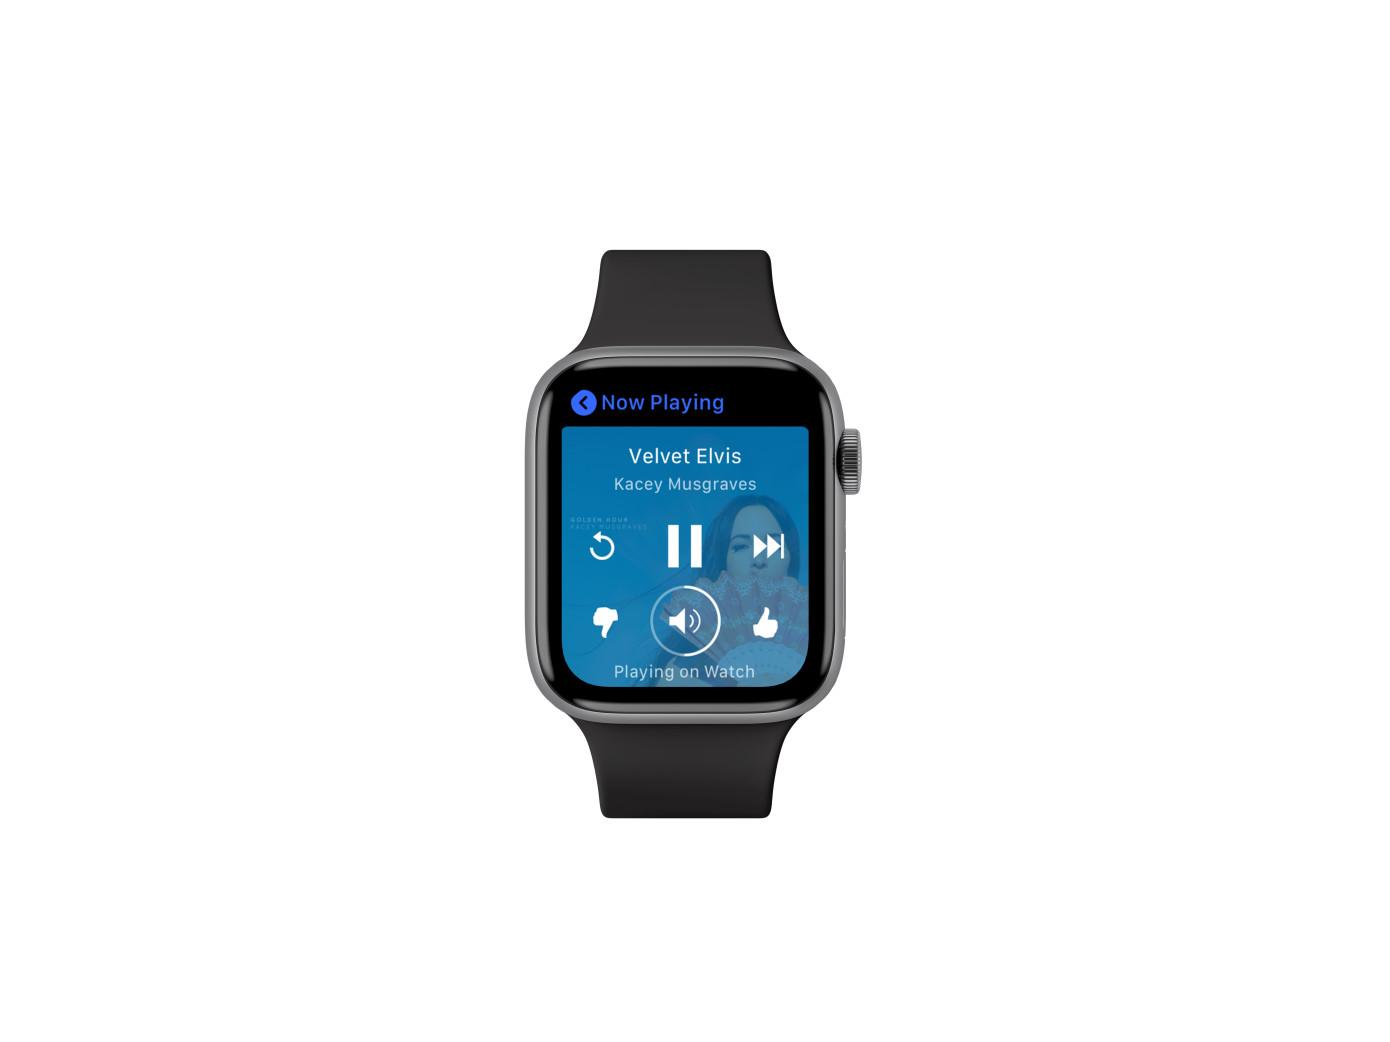 applewatchspotify